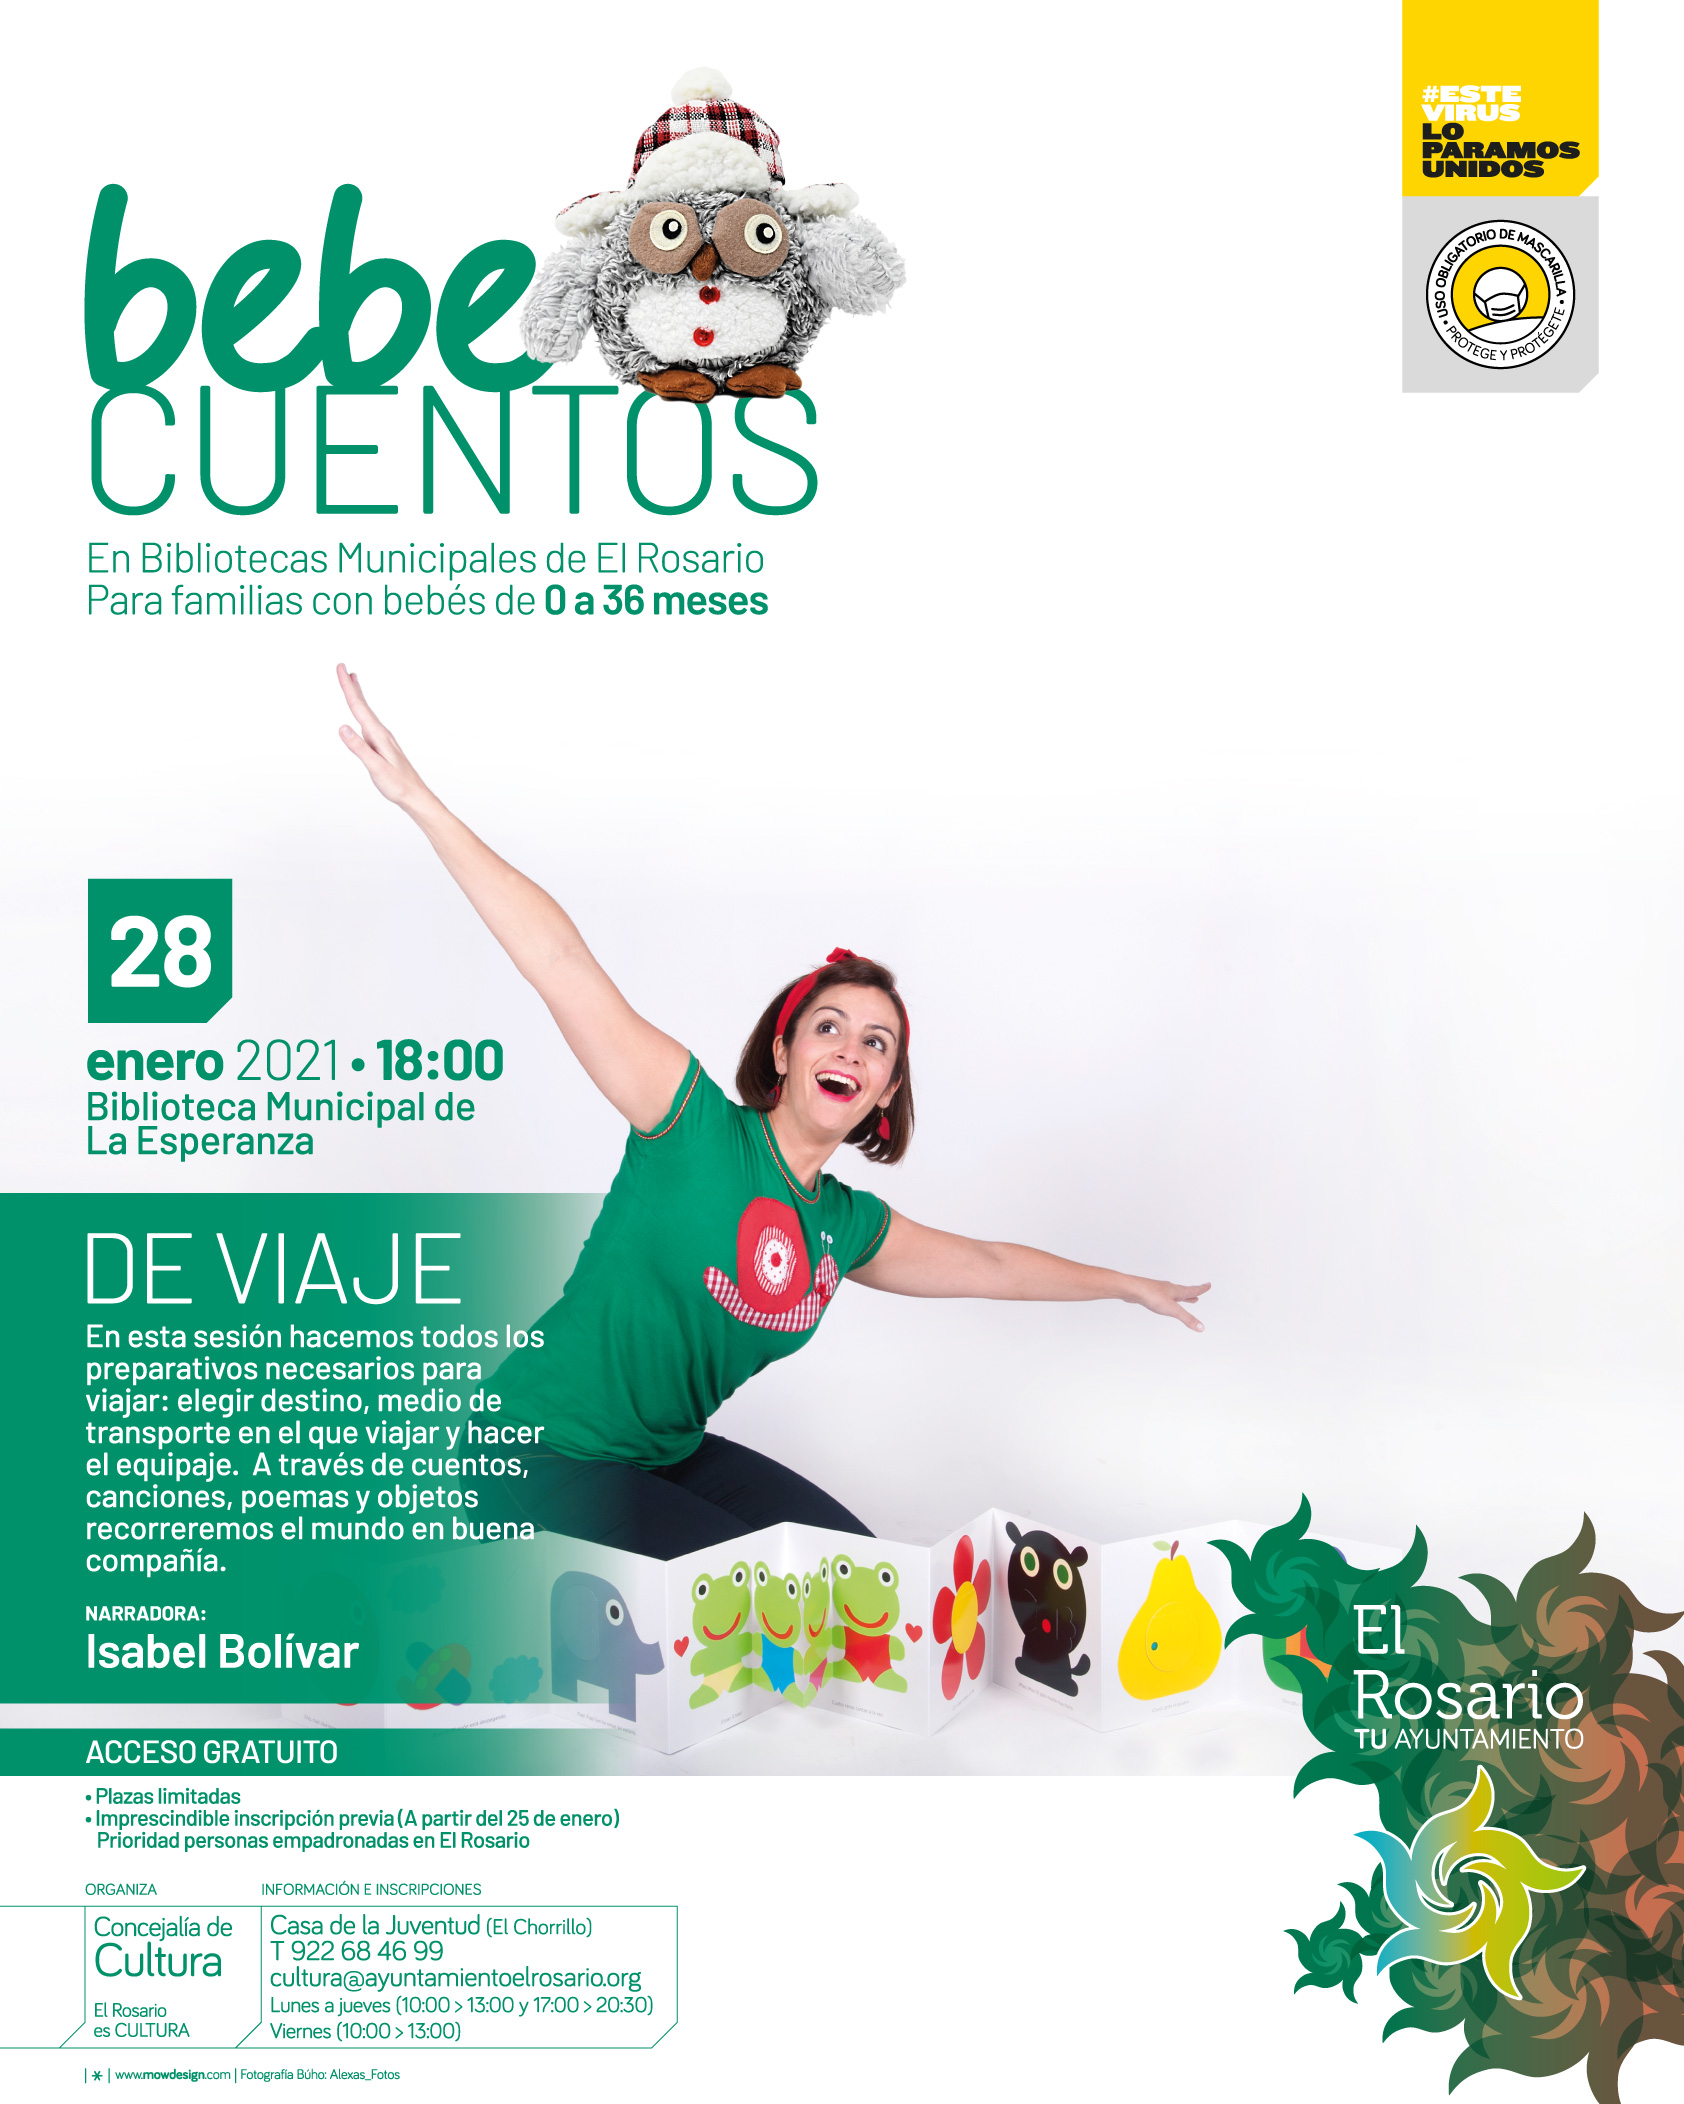 BEBECUENTOS-20210128-CARTEL_A3-20210119-01af-redes